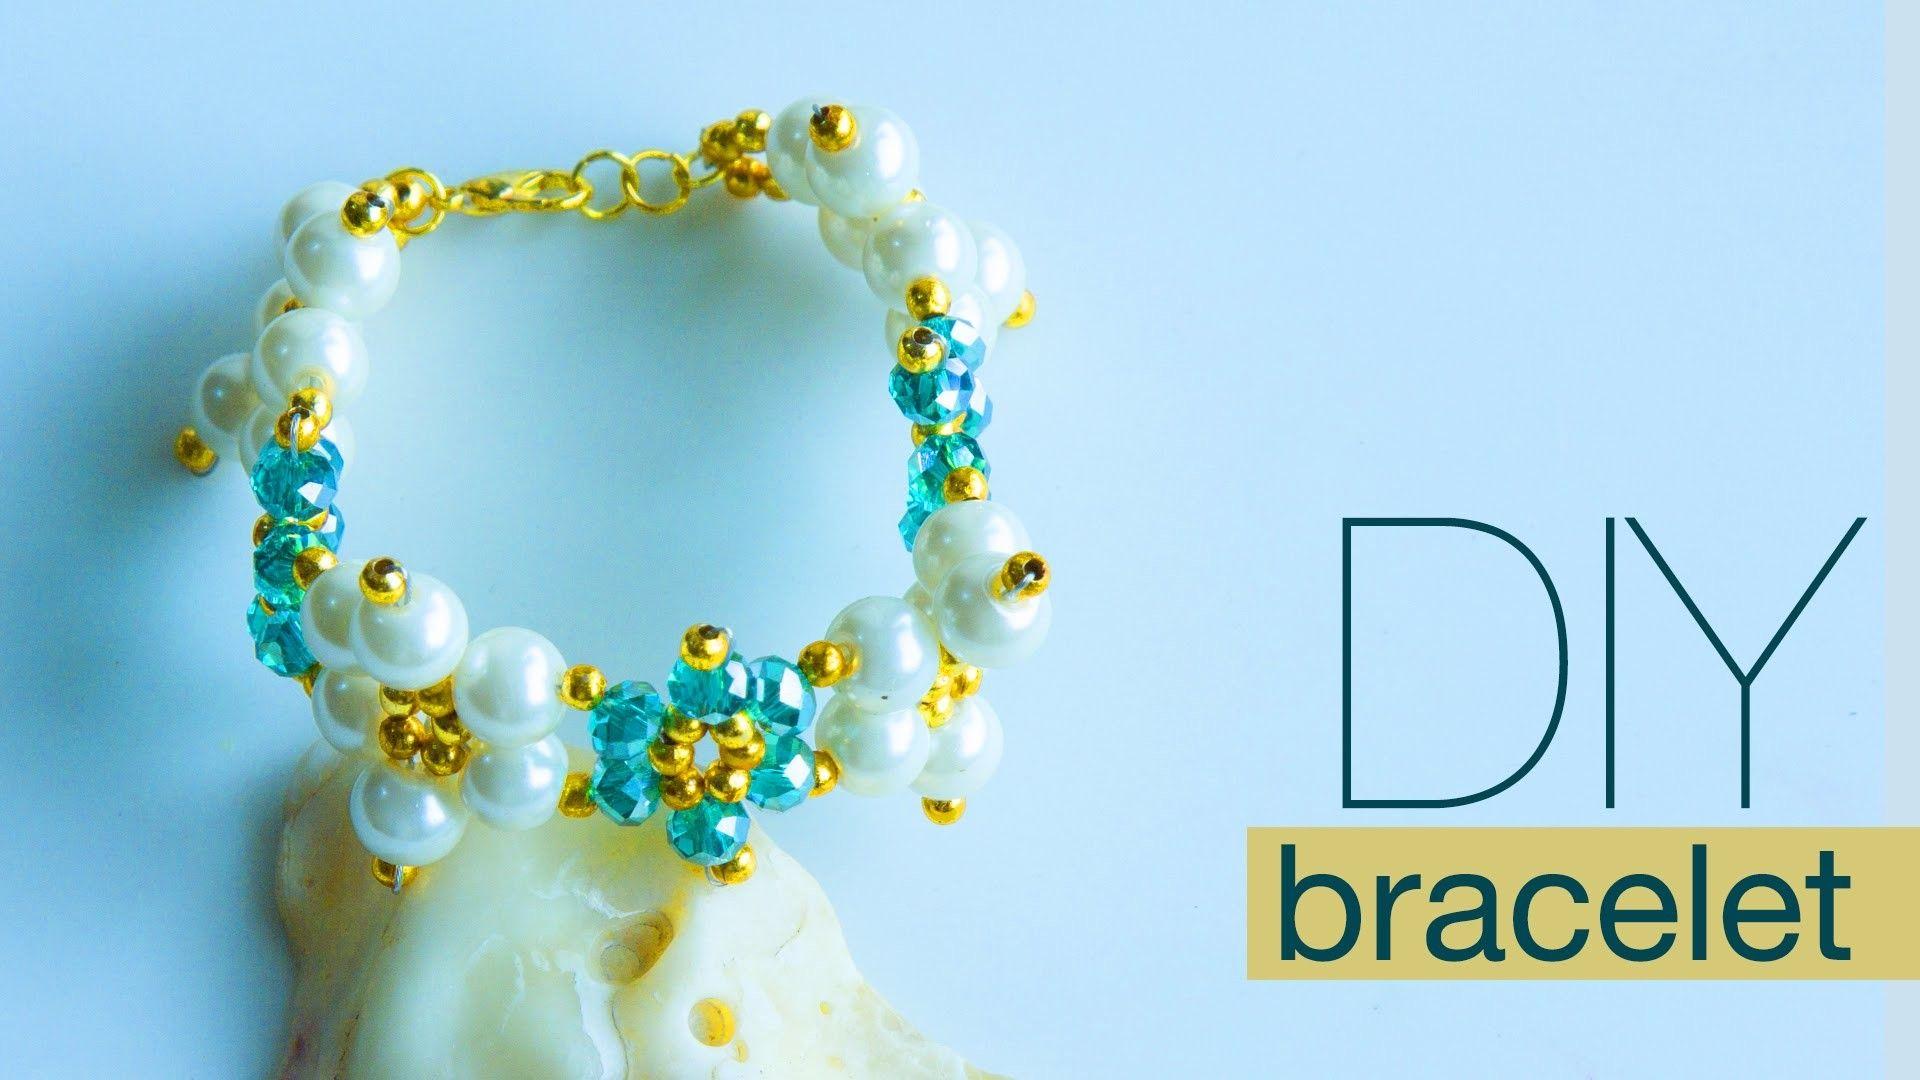 How To Make Bracelet - Diy Bracelet